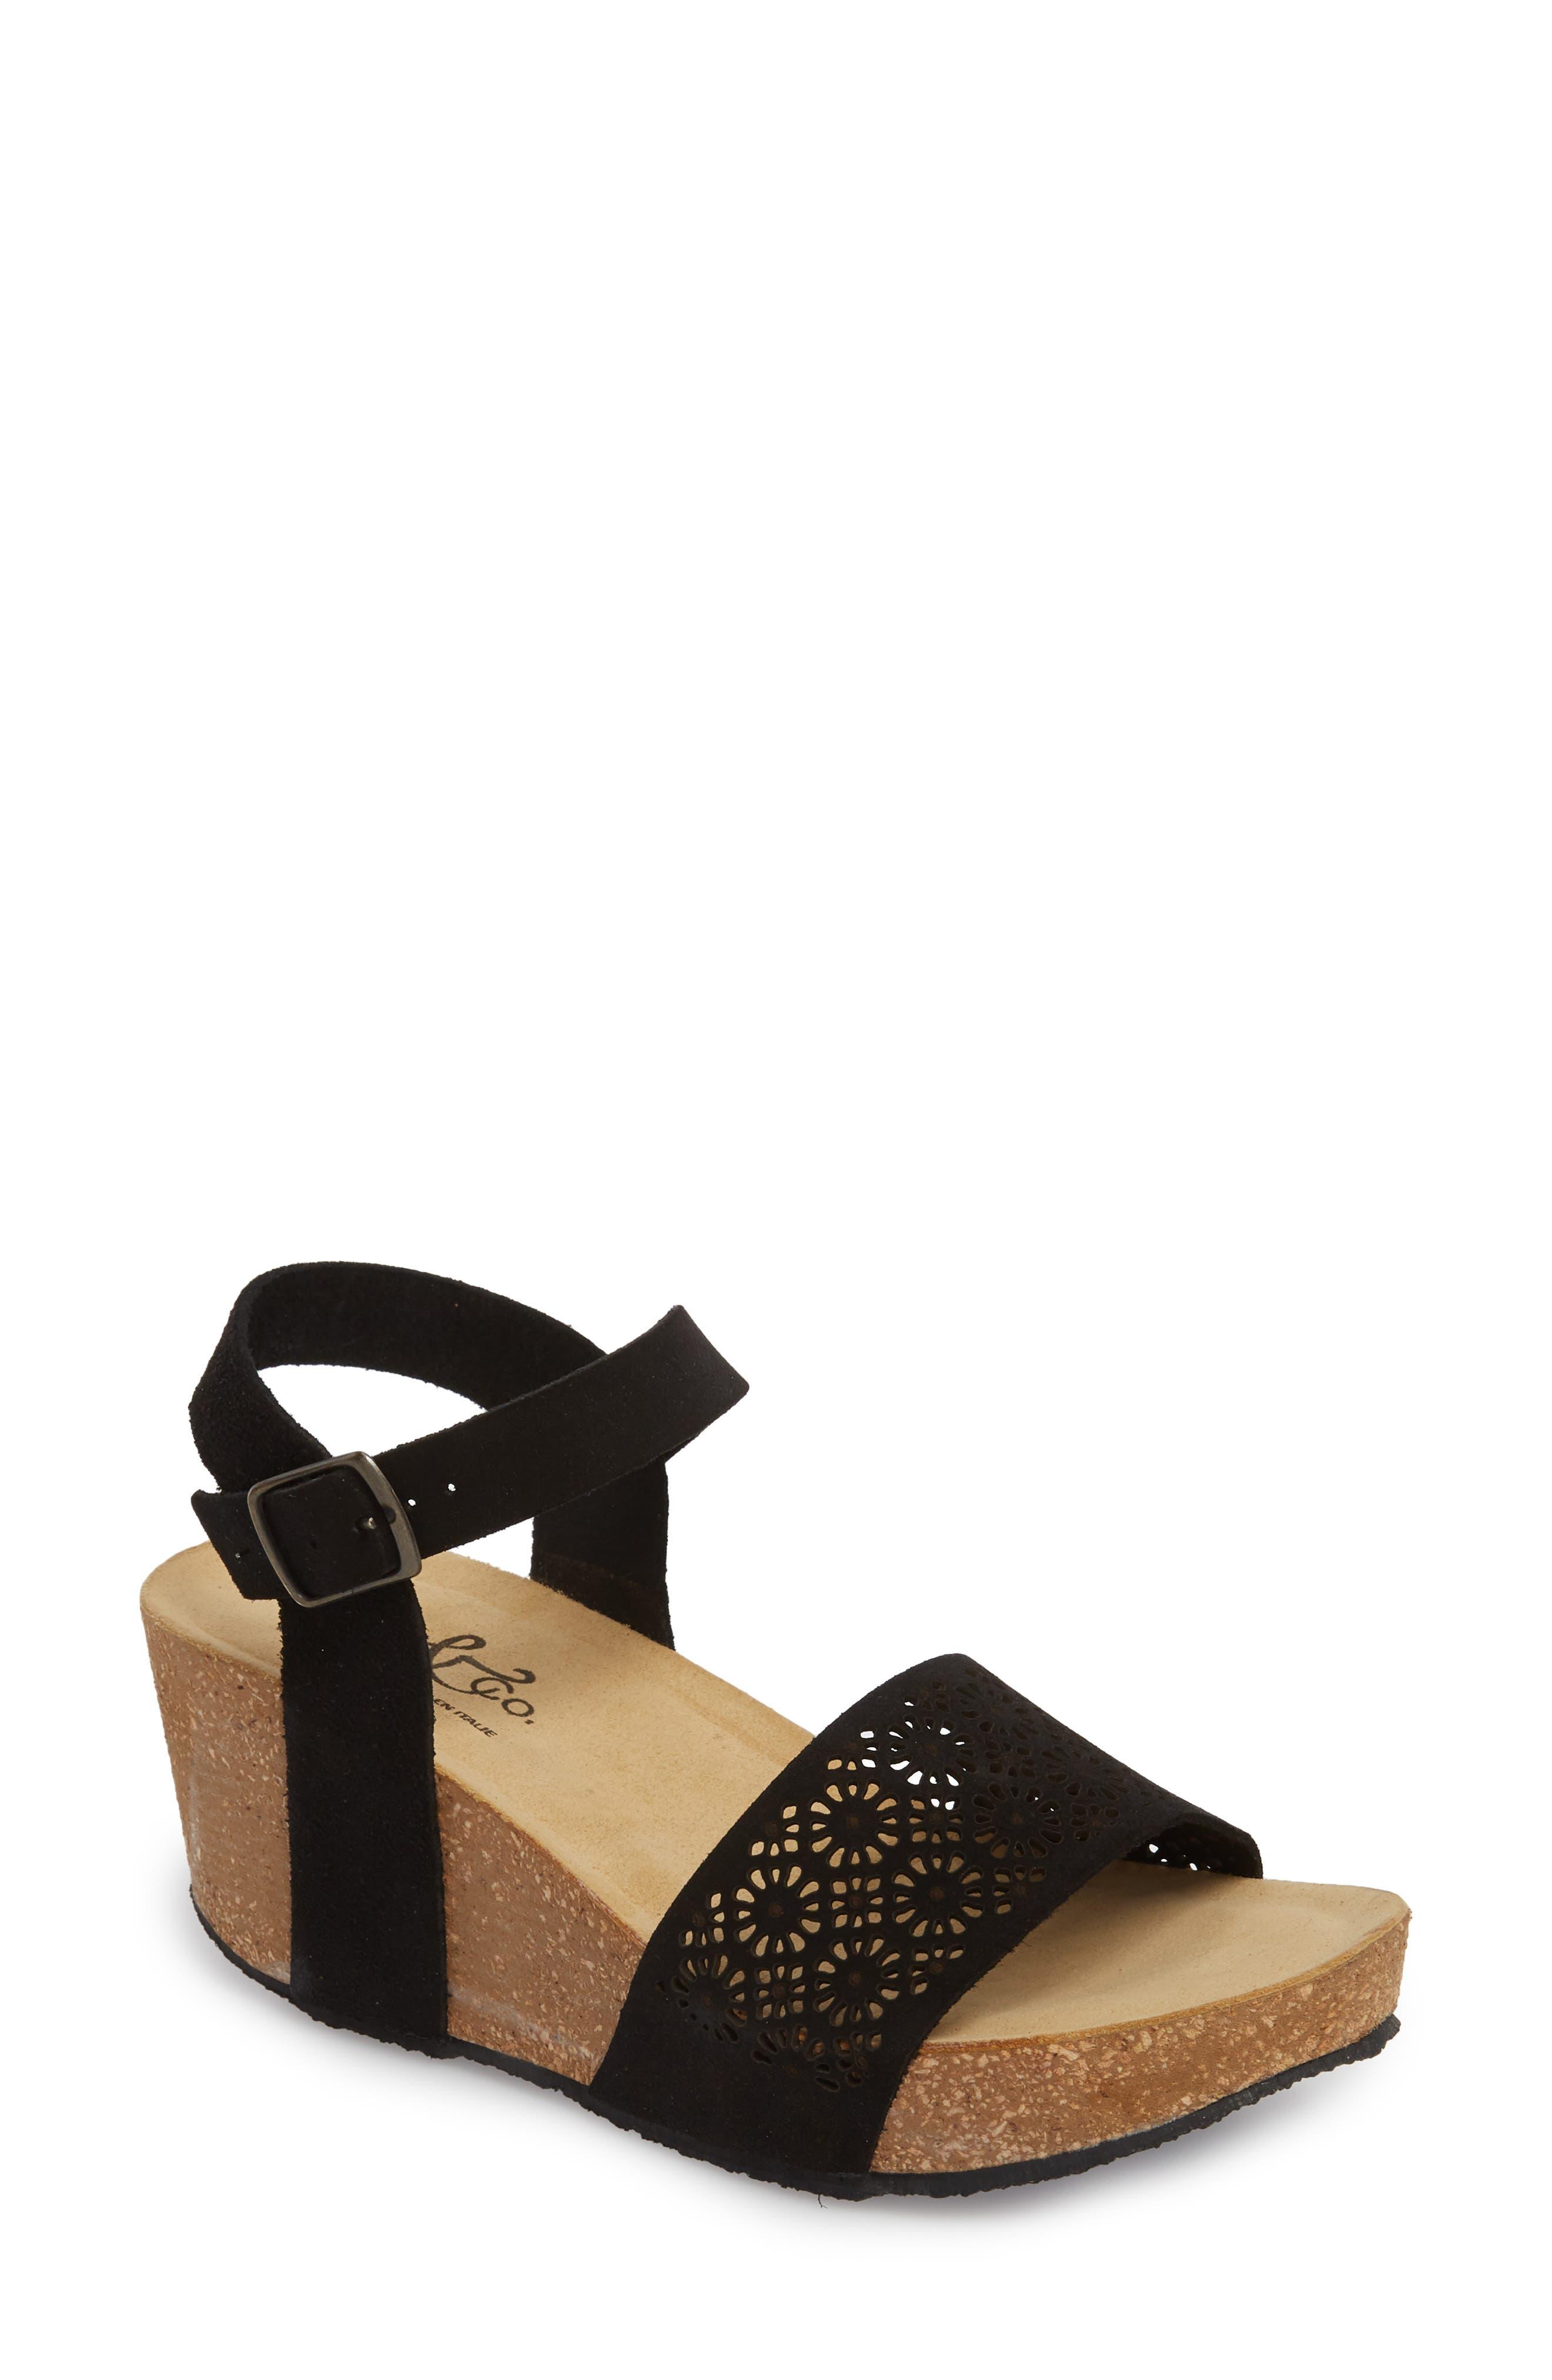 Bos. & Co. Lolo Platform Wedge Sandal - Black